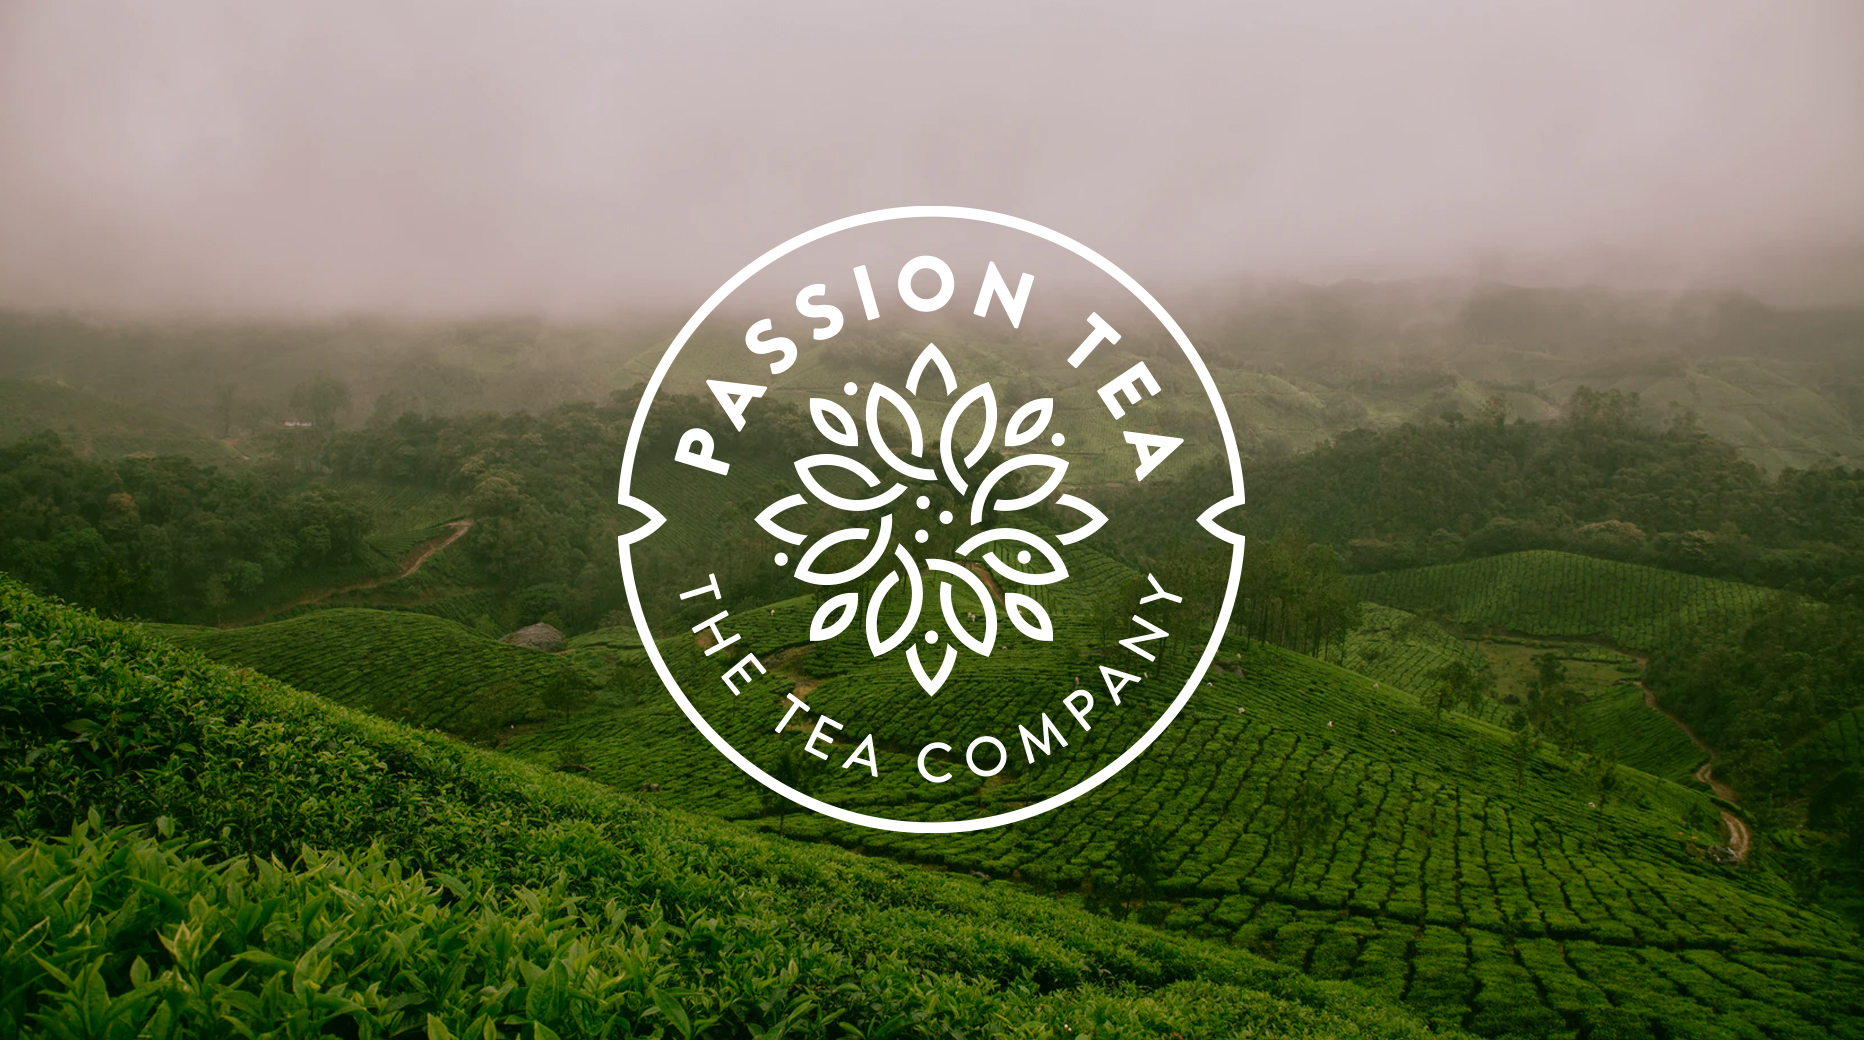 Rebranding for Passion Tea Product Line of the Cafés Cornellà Brand